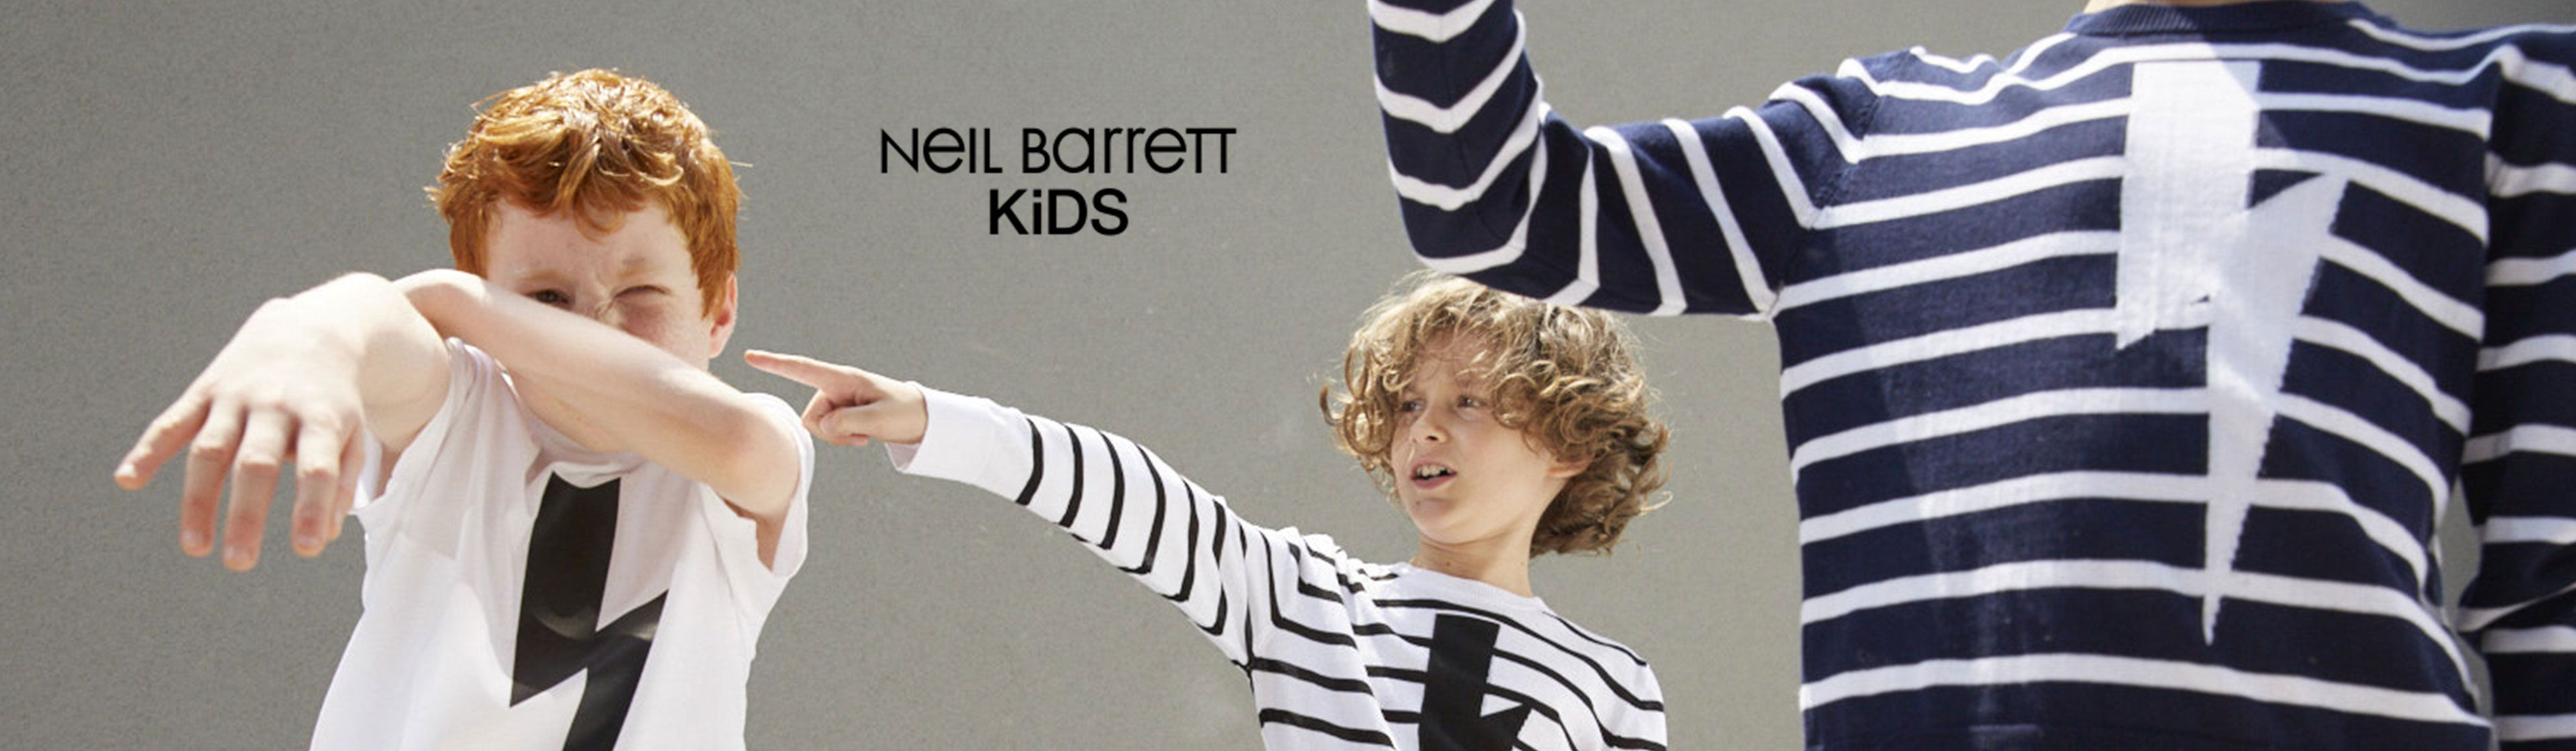 NEW BRAND ALERT: NEIL BARRETT KiDS